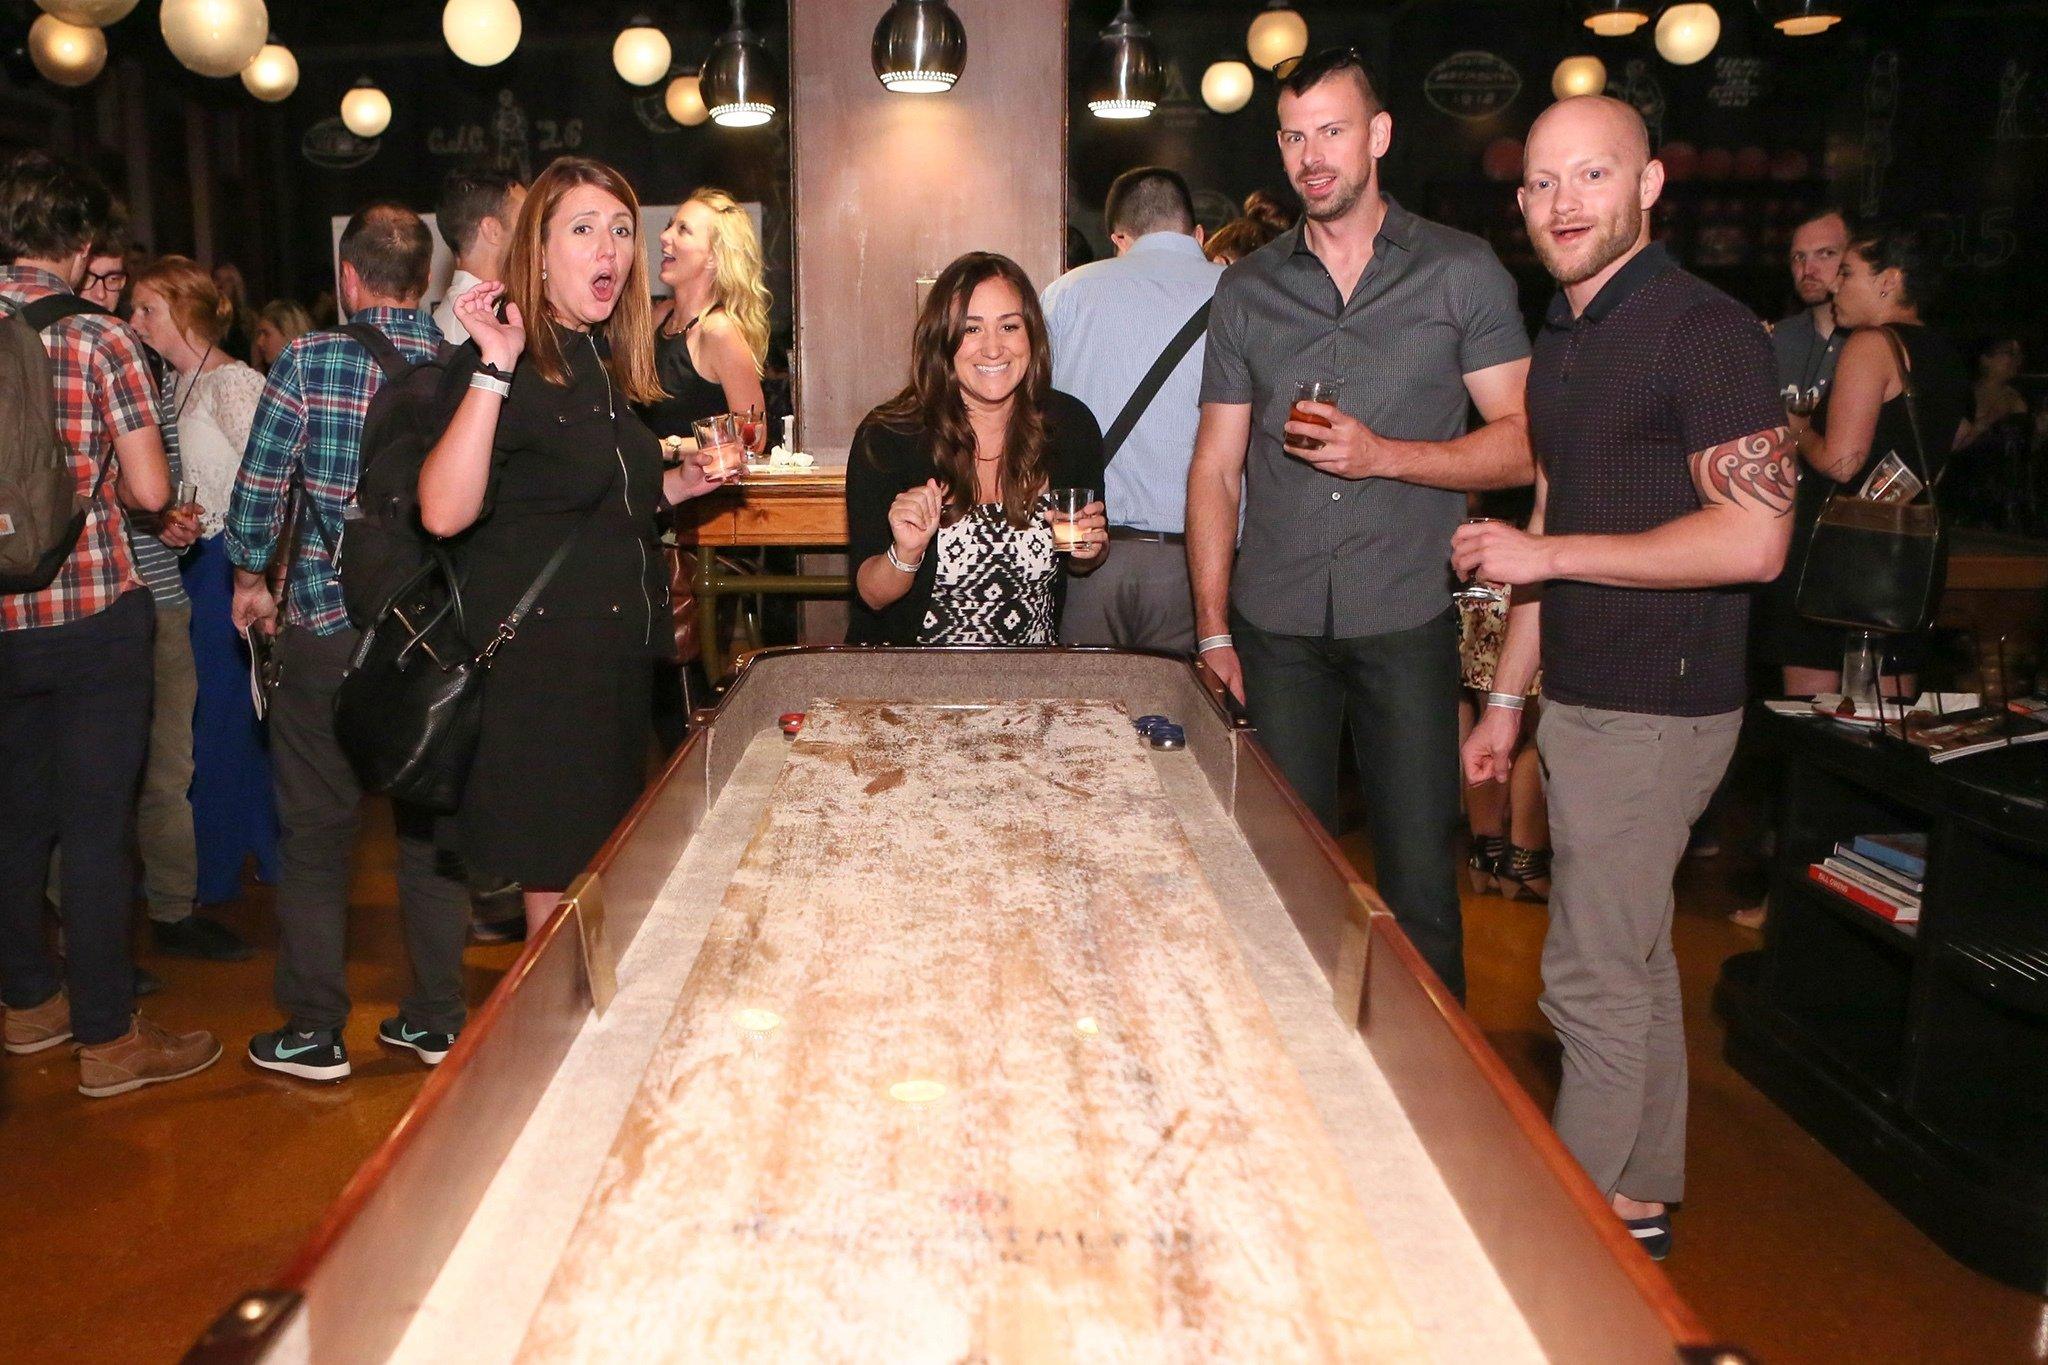 10 Lovable Fun Date Ideas In Chicago 11 fun date ideas in chicago 2021